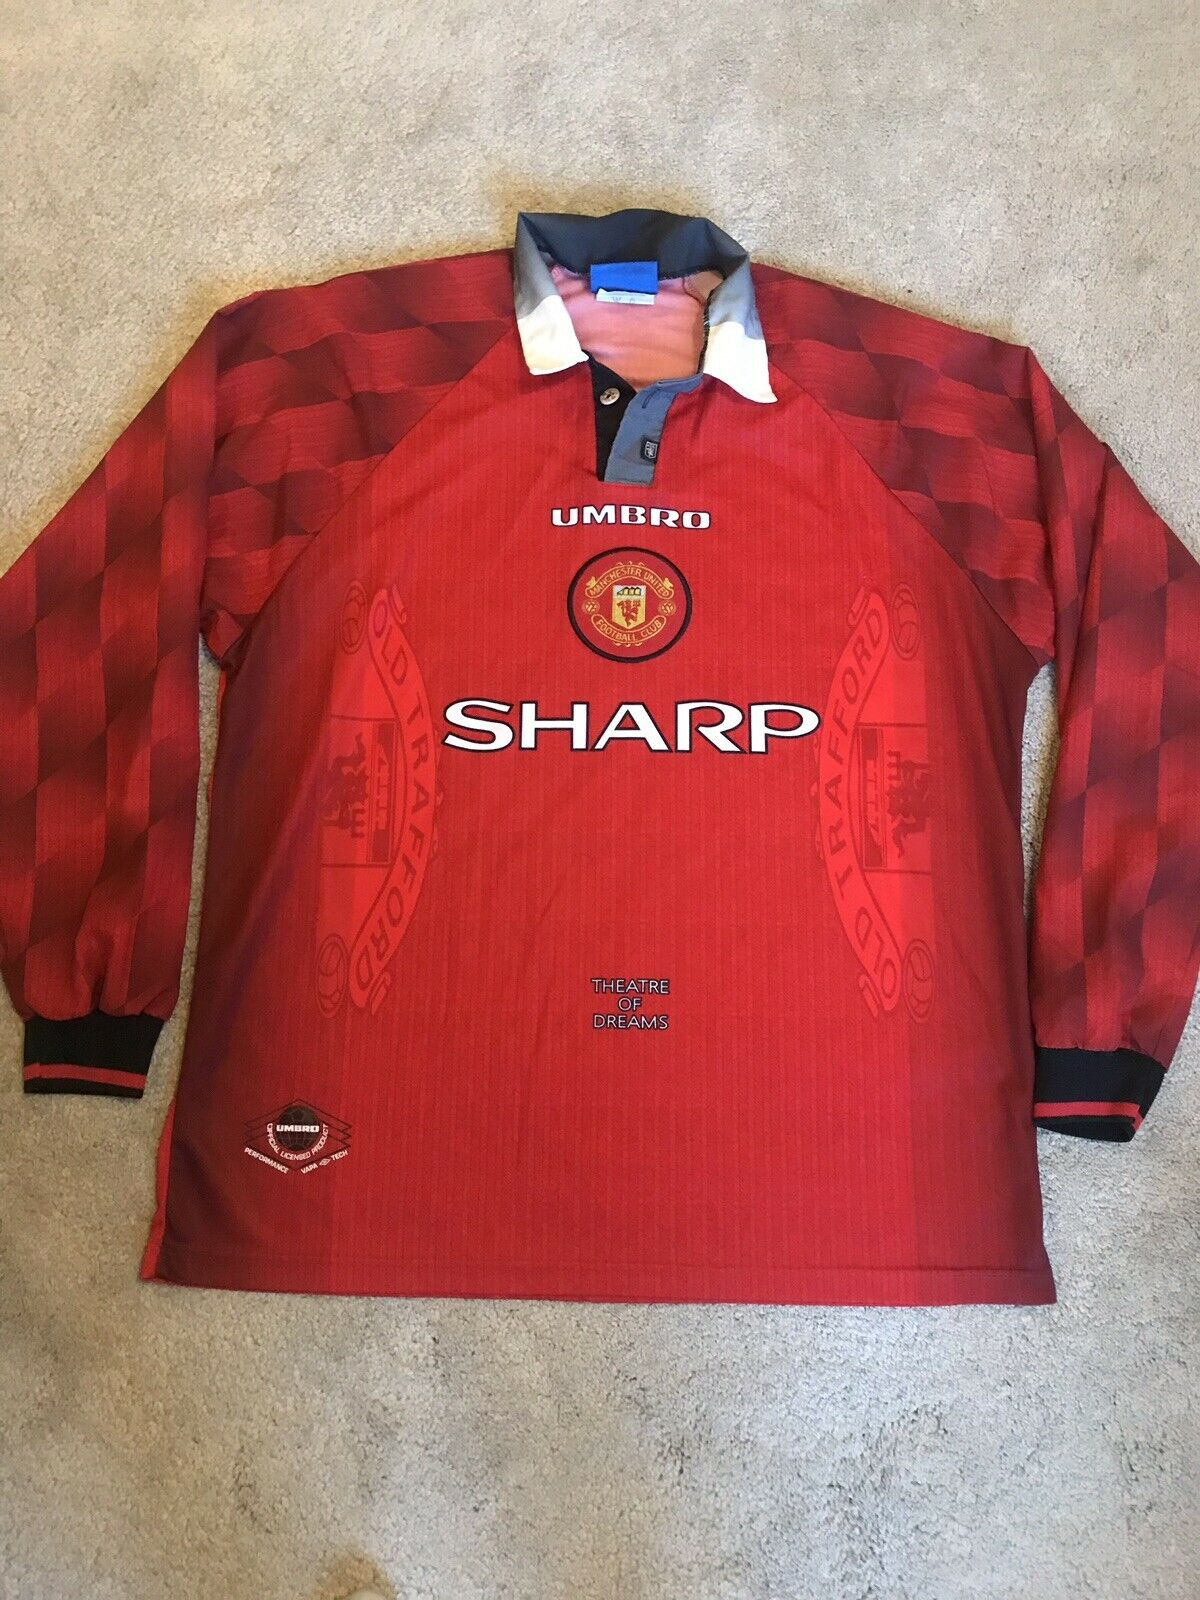 uomochester United Home Camicia 199698 Adulti Extra gree XL uomoICA LUNGA